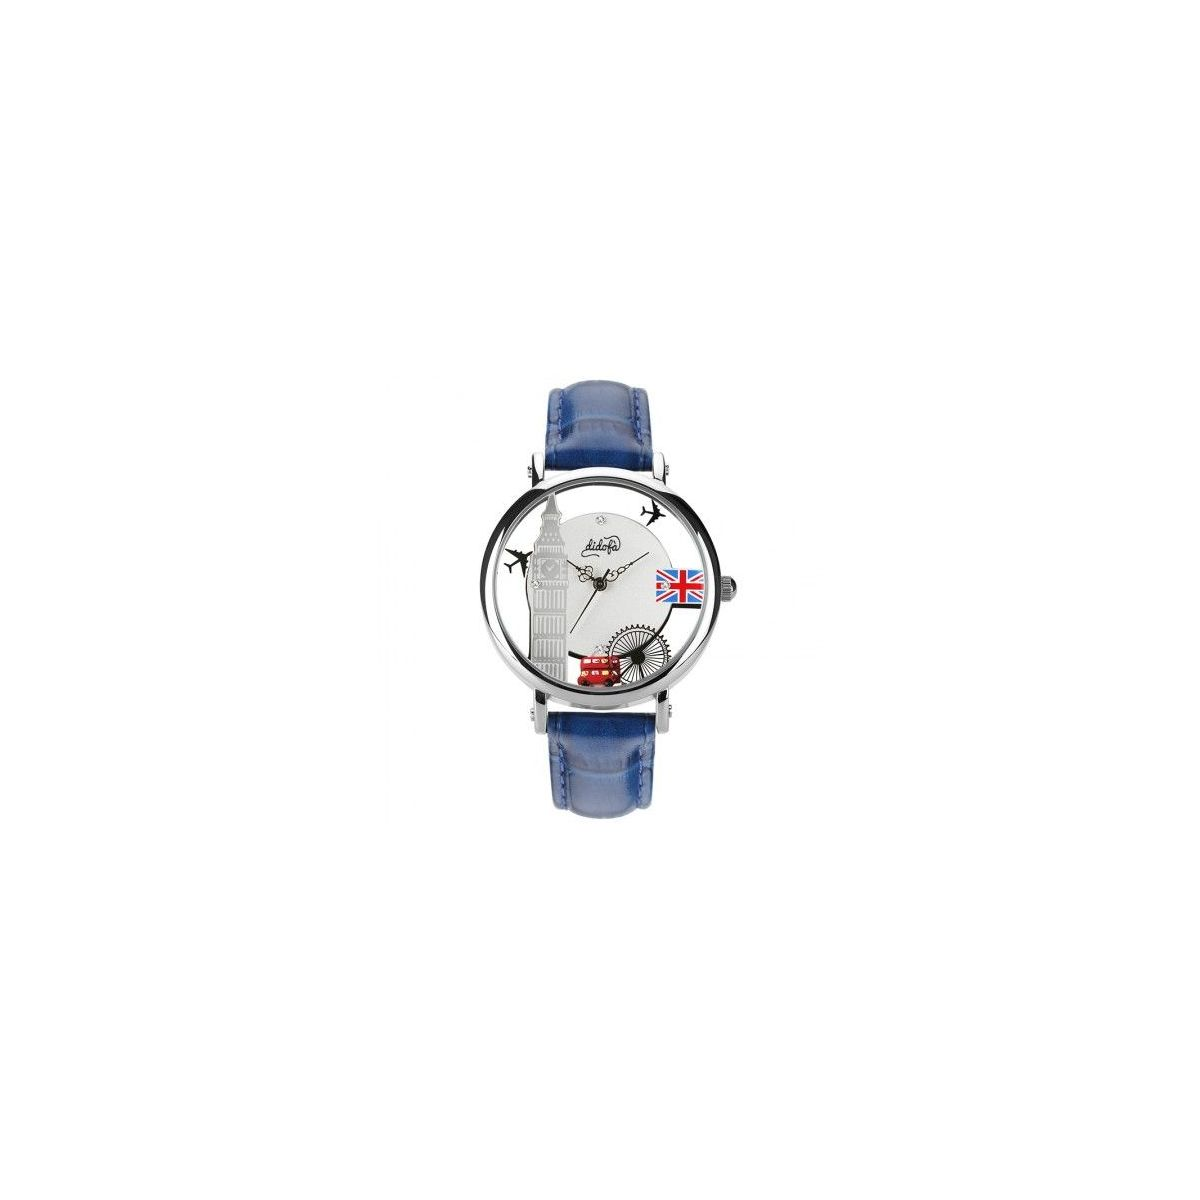 Orologio Donna Didofà Voyage Df-3015B